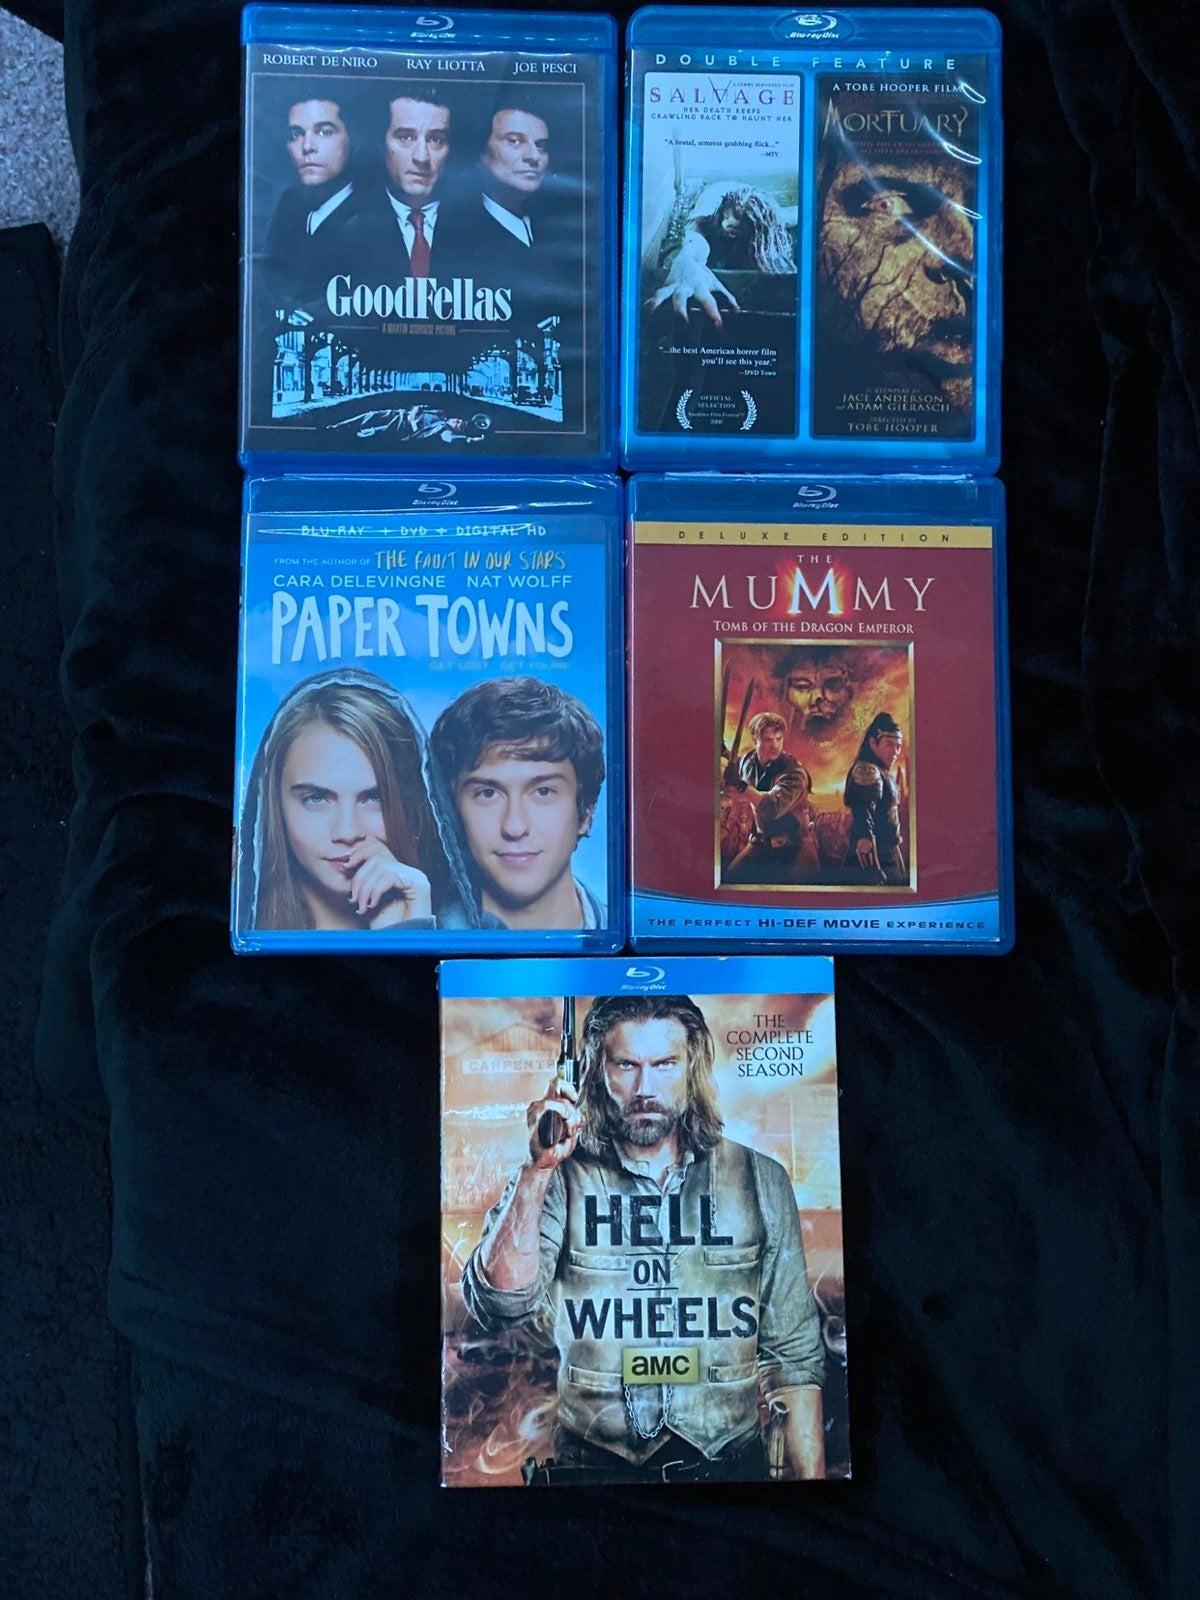 Lot of 6 Blu-Ray Movies